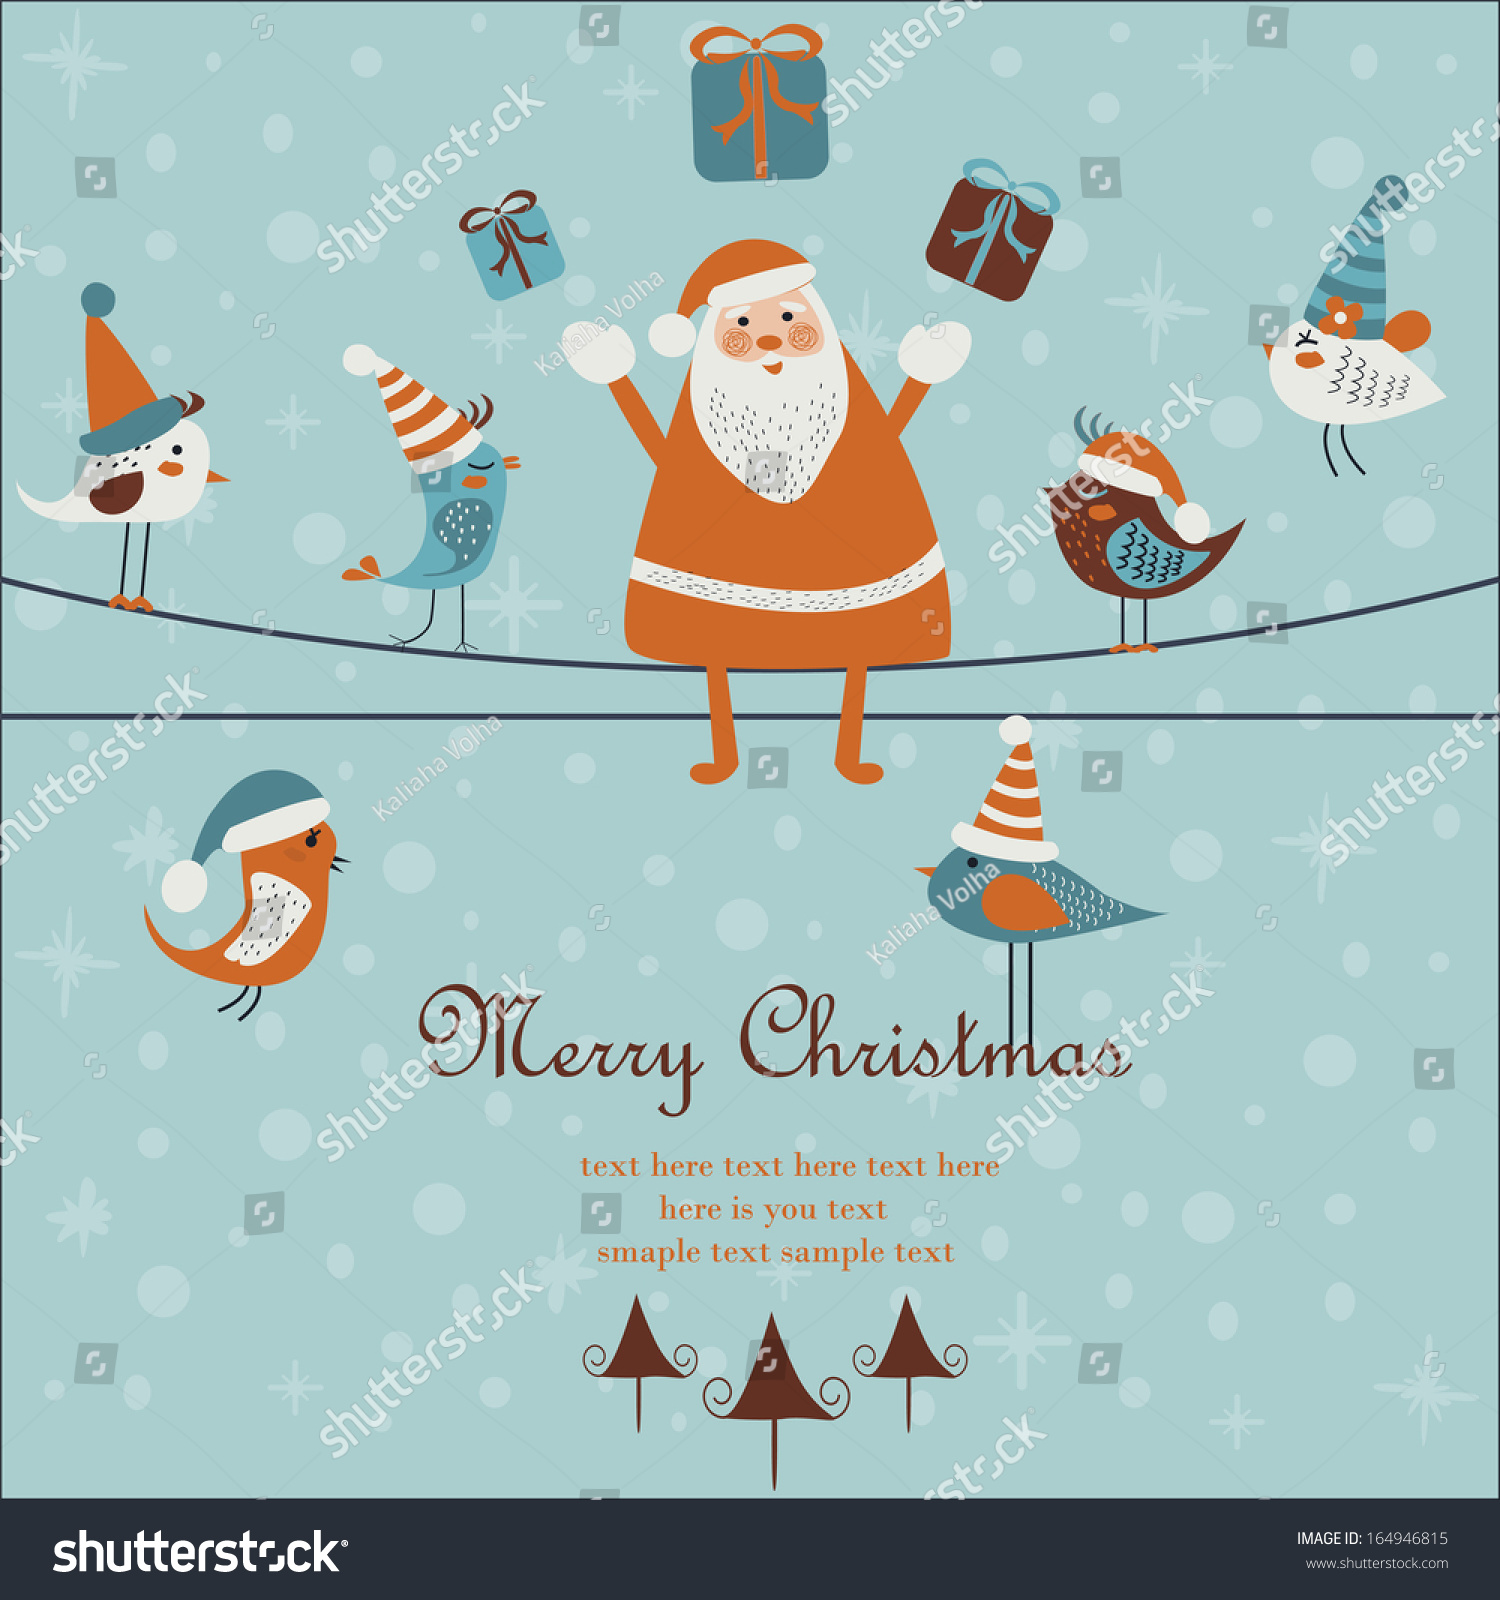 Christmas Happy New Year Greeting Card Stock Photo Photo Vector